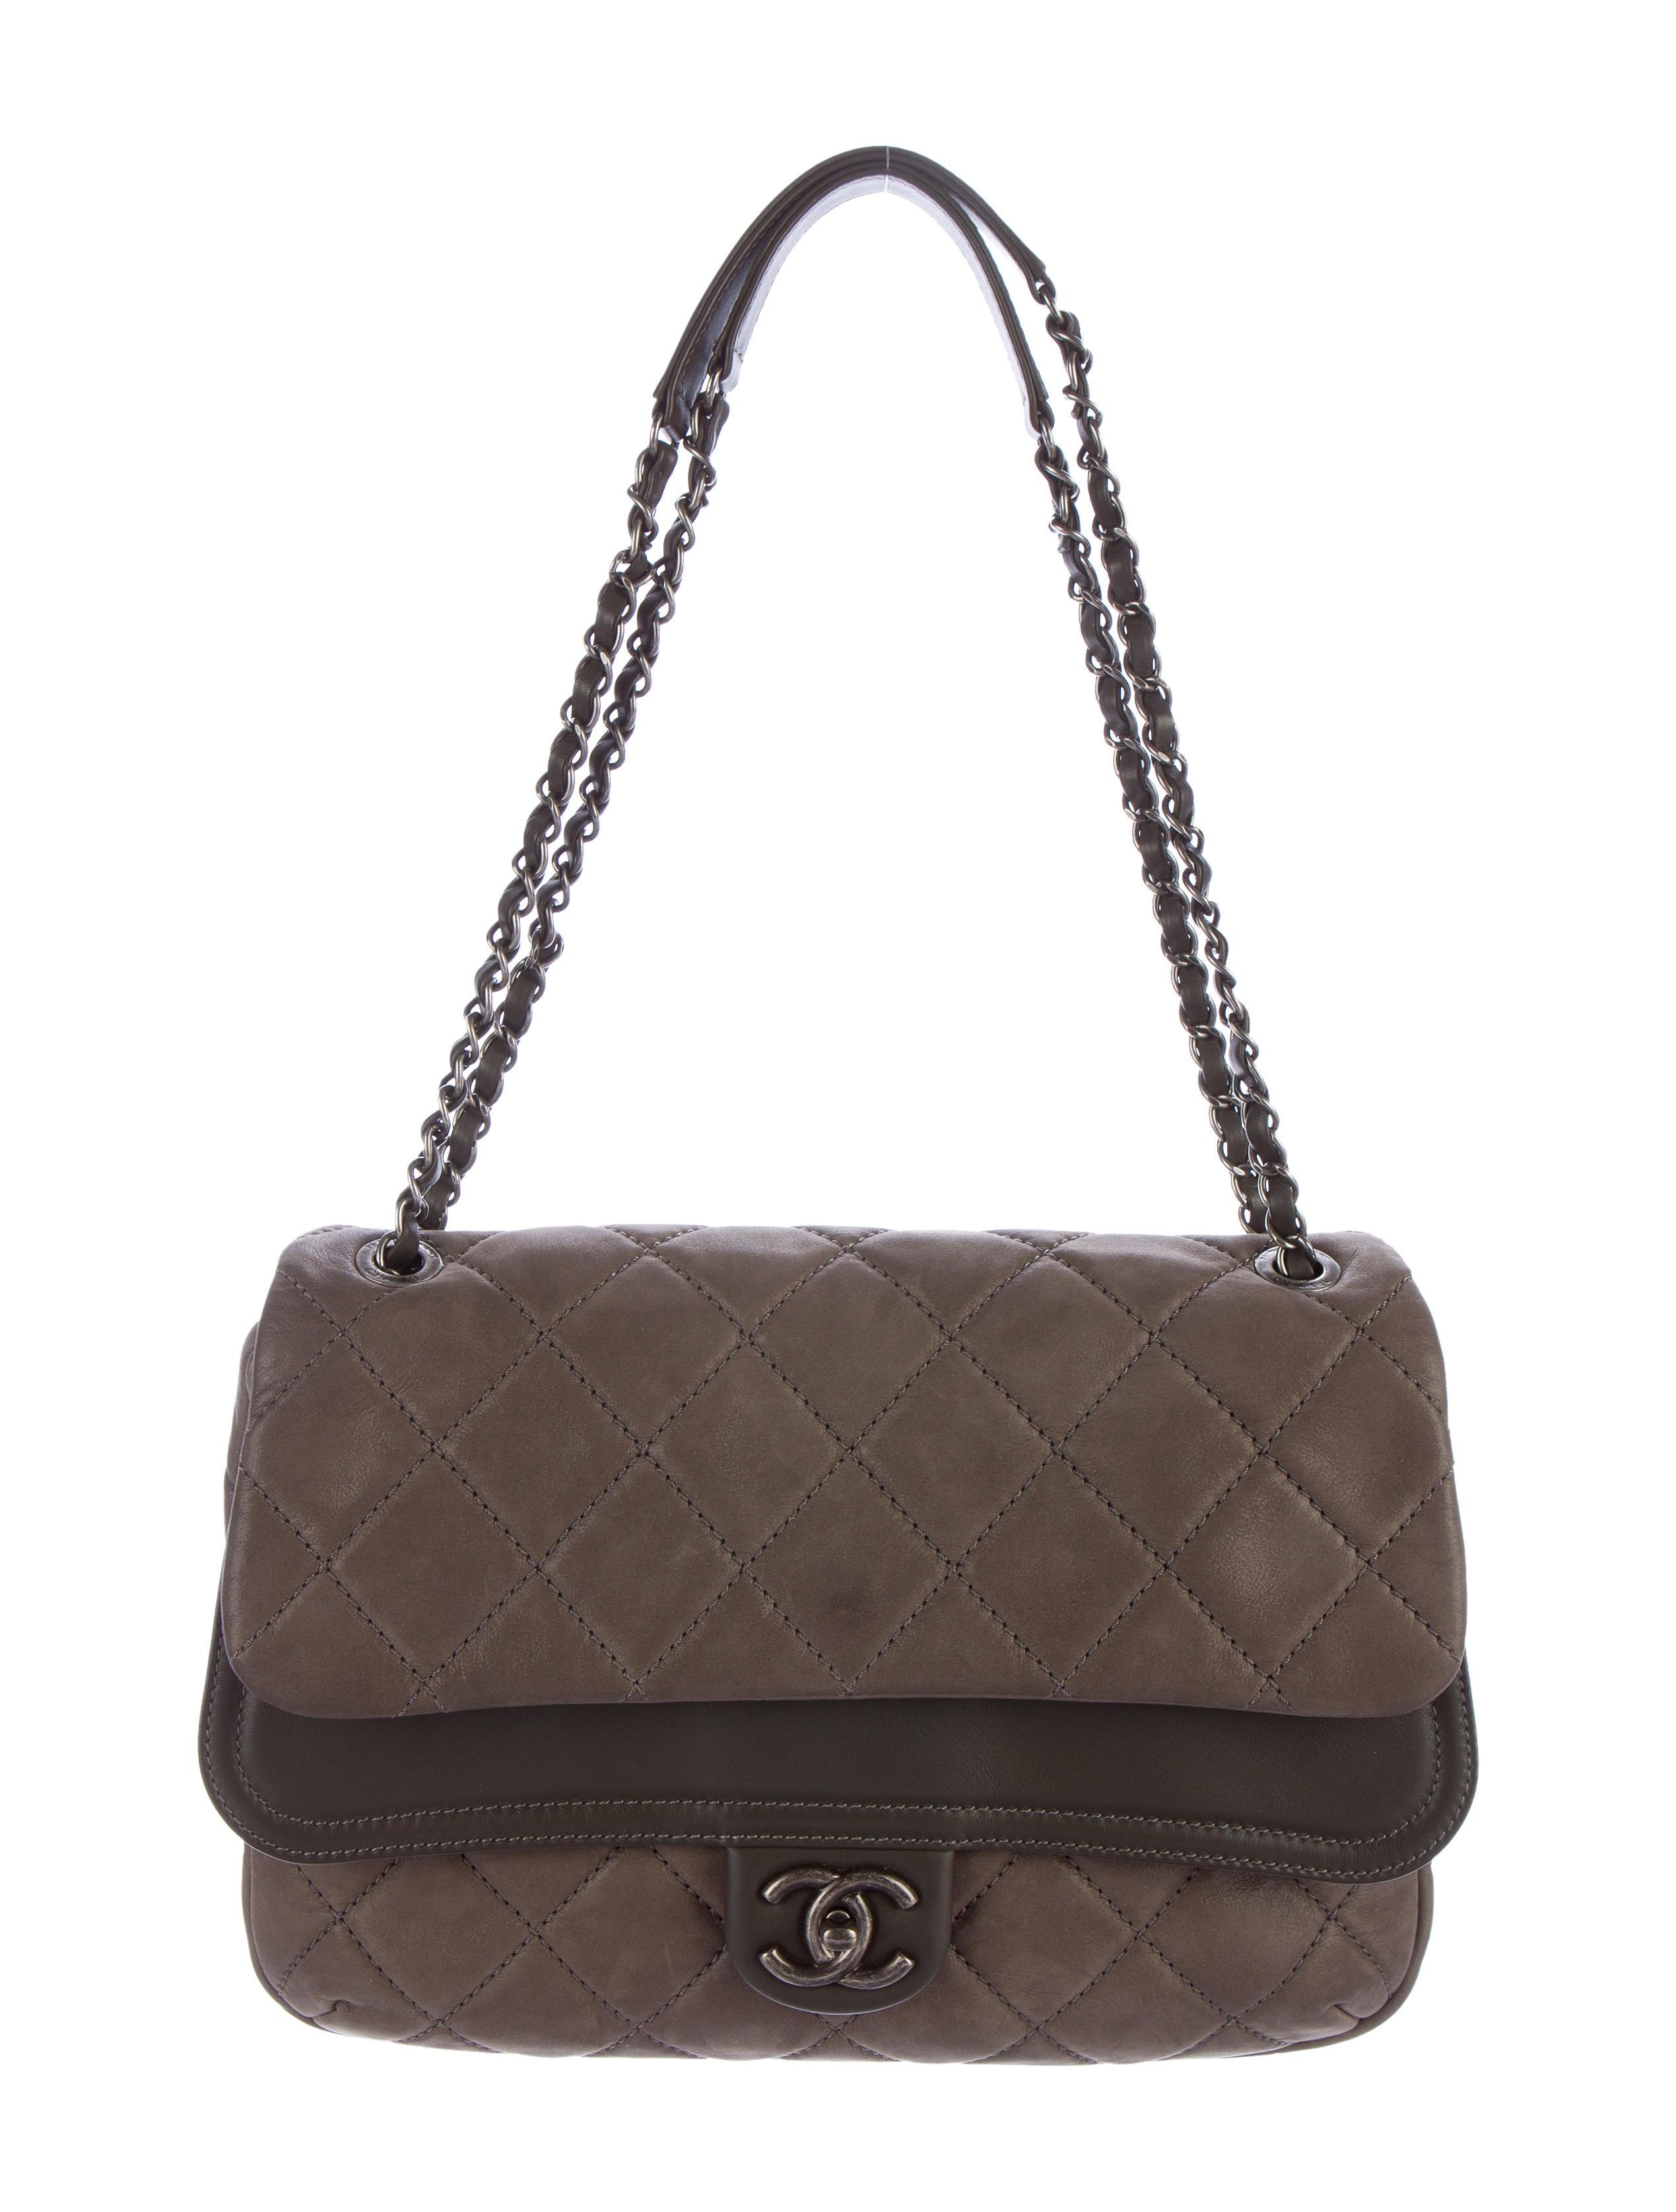 0545a04abe5a0e Chanel Iridescent Calfskin In the Mix Jumbo Double Flap - Handbags ...